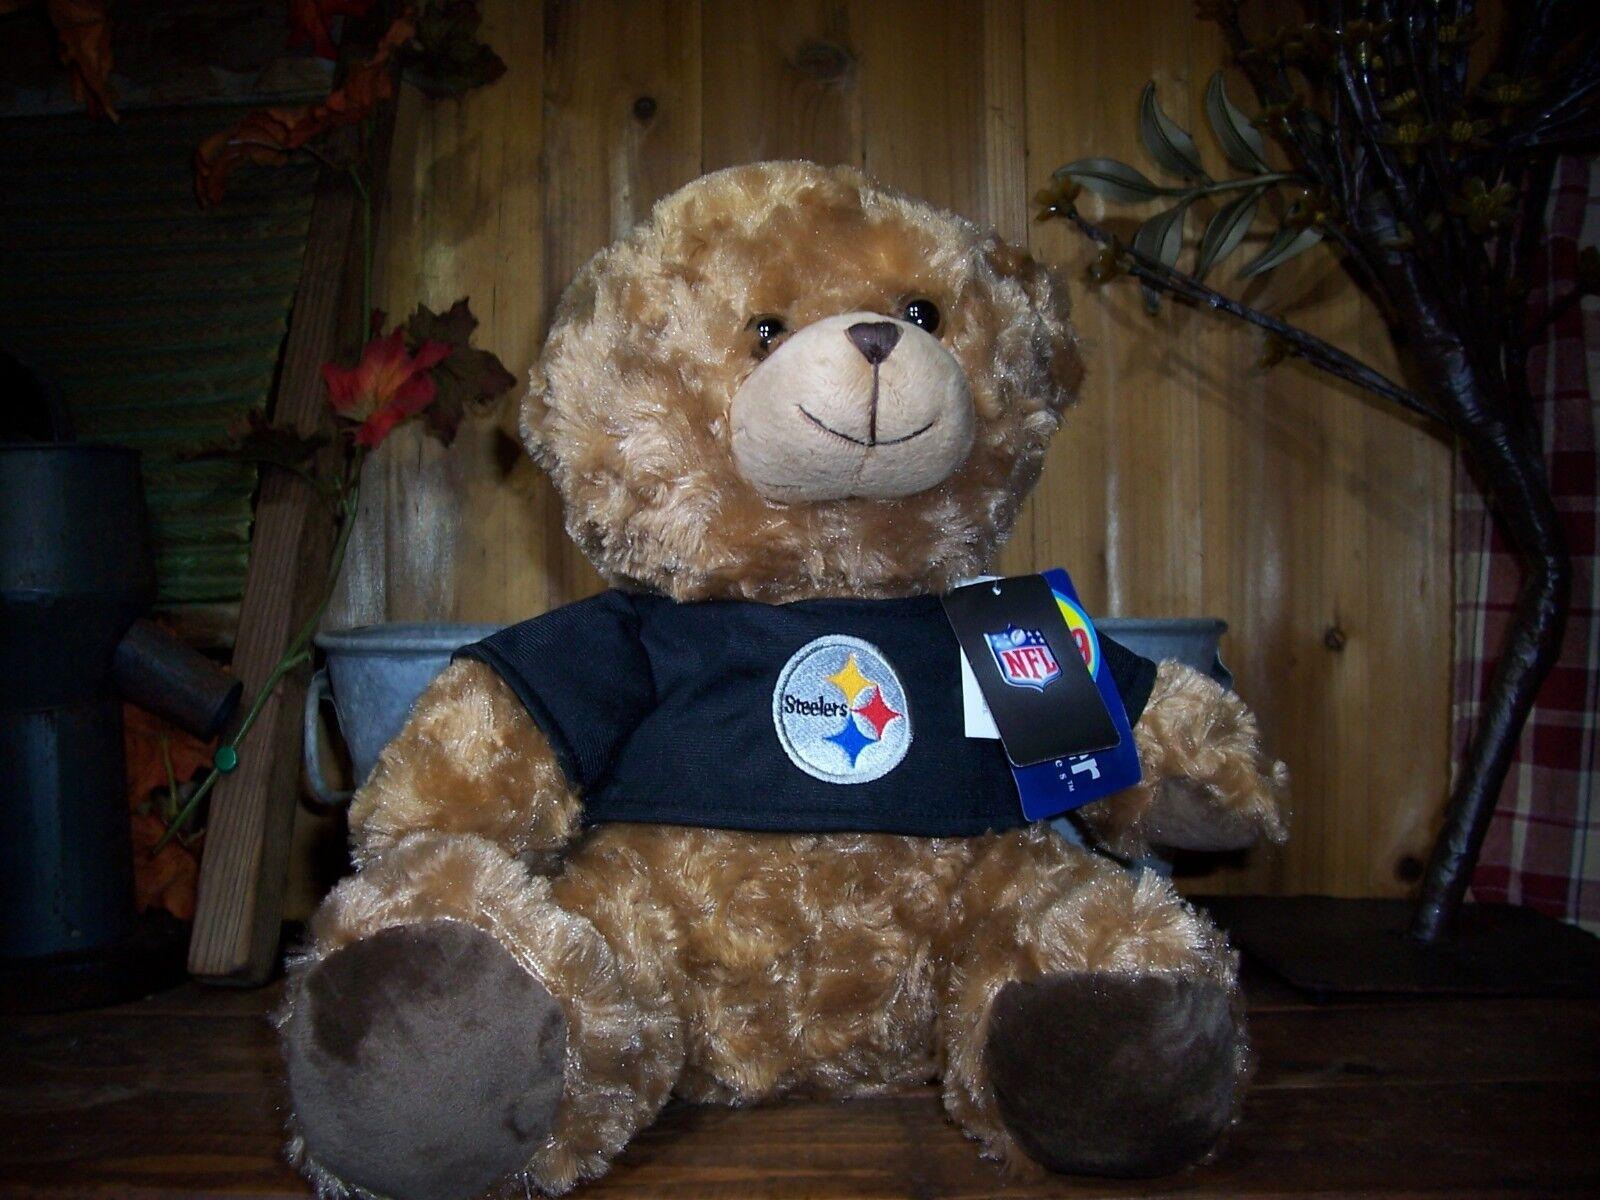 PITTSBURGH STEELERS NFL TEDDY BEAR 12 INCHES BROWN FUR NOVEL